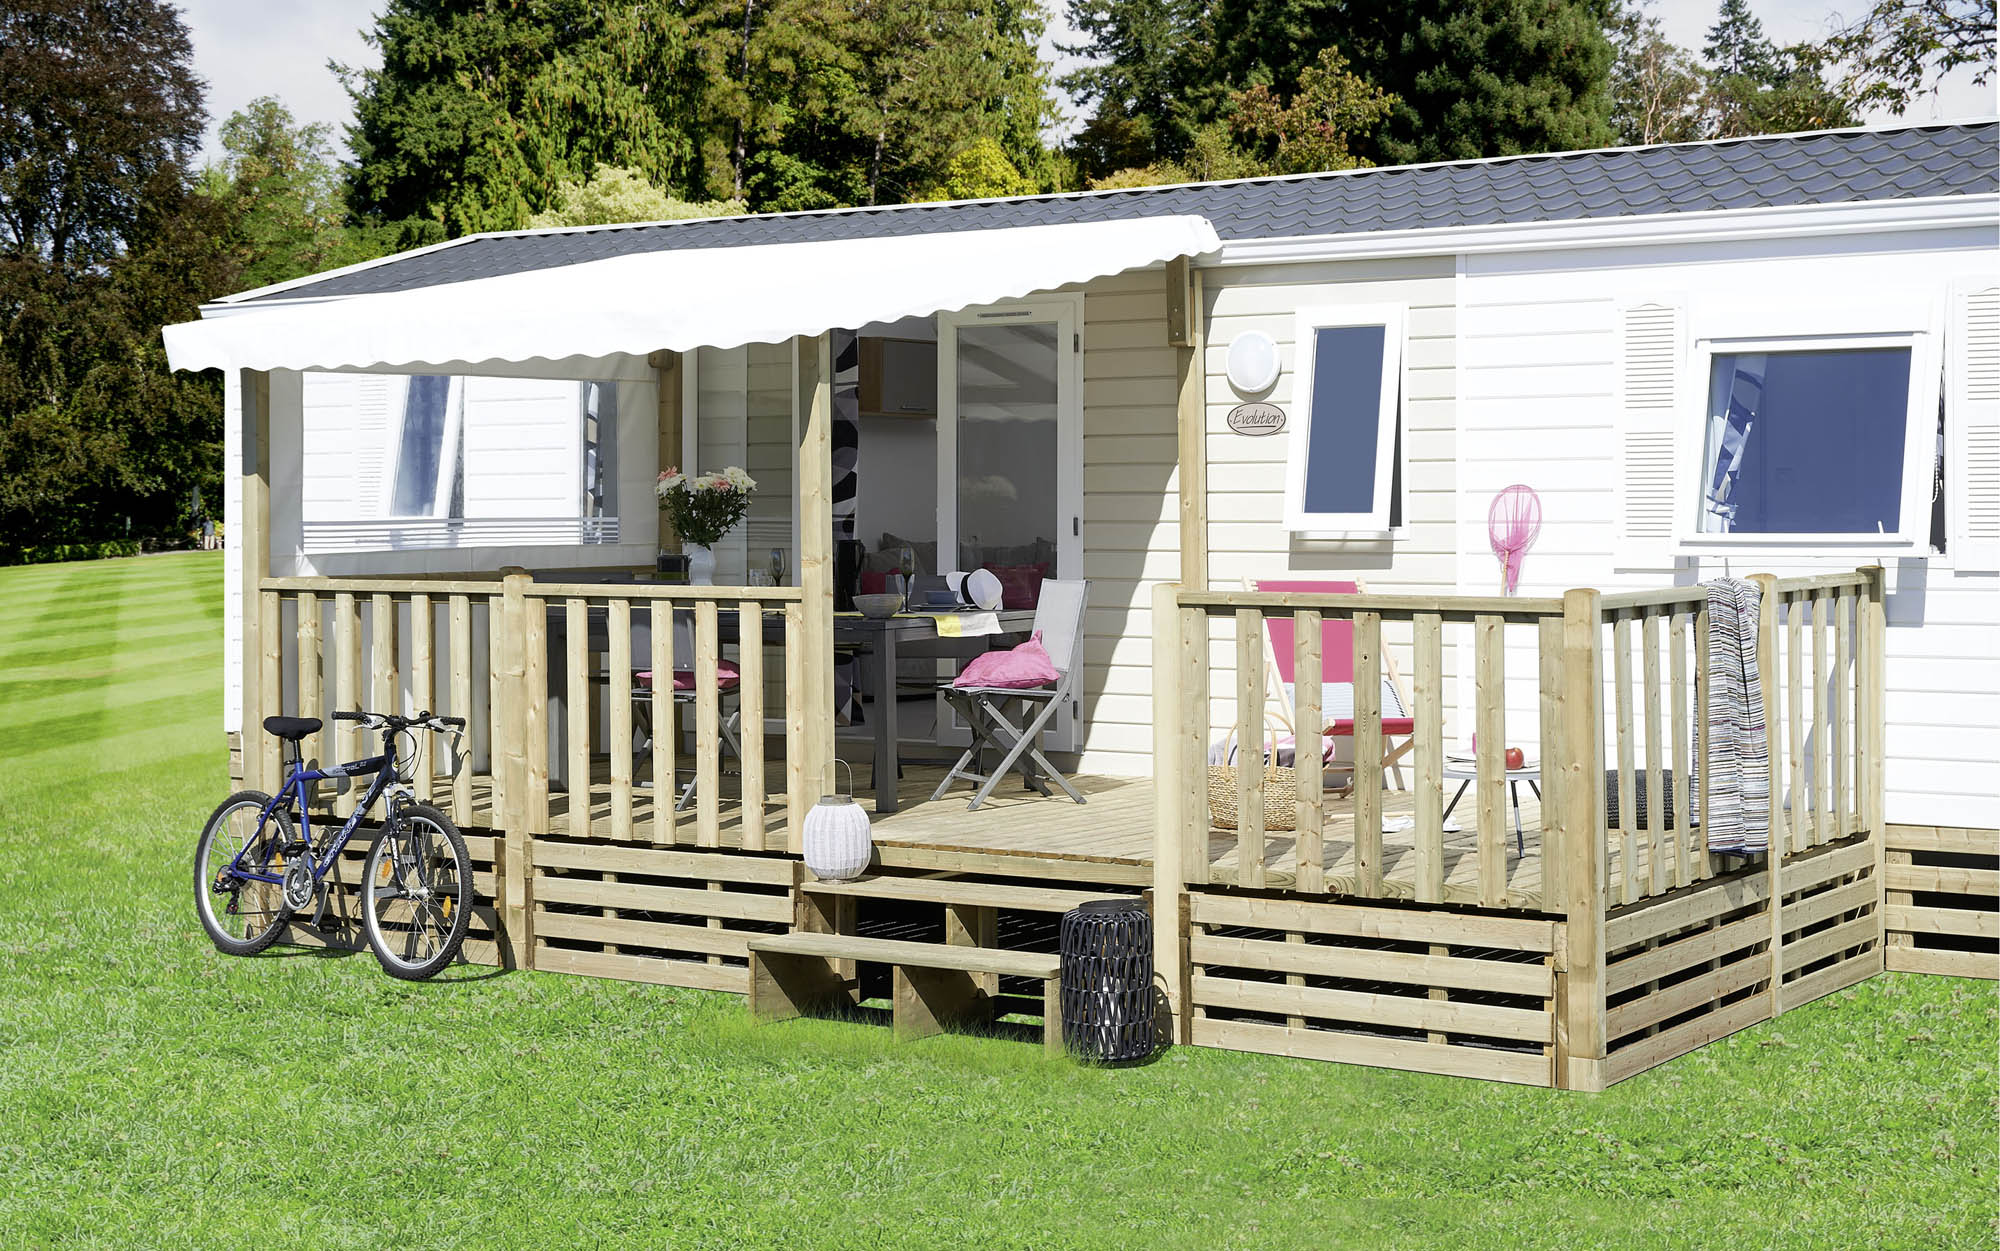 Terrasse mobil-home couverte & semi-couverte, CLAIRVAL Mobil-Home ...